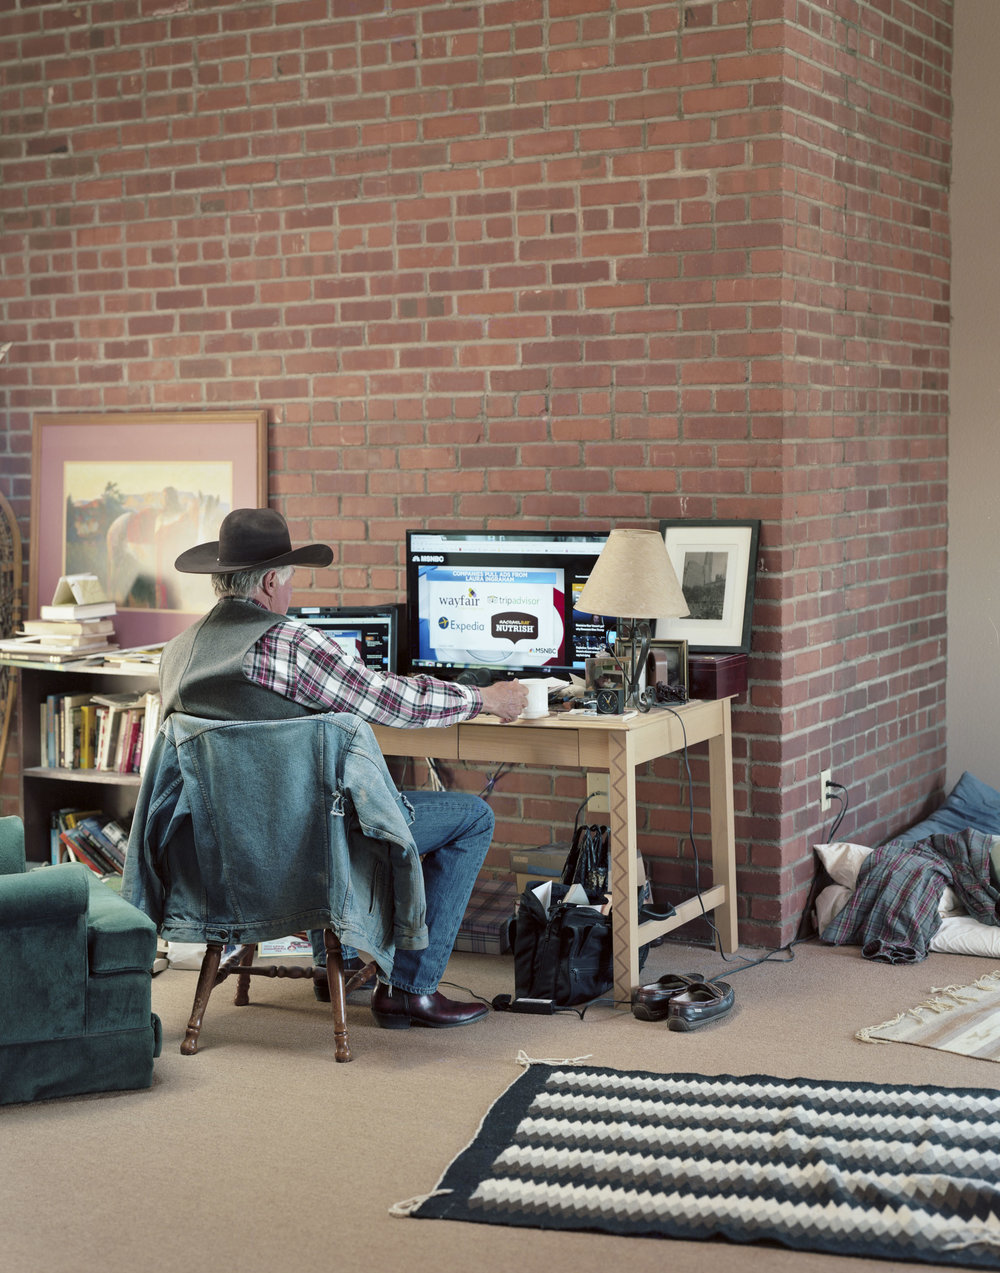 Cowboy_desk008.jpg